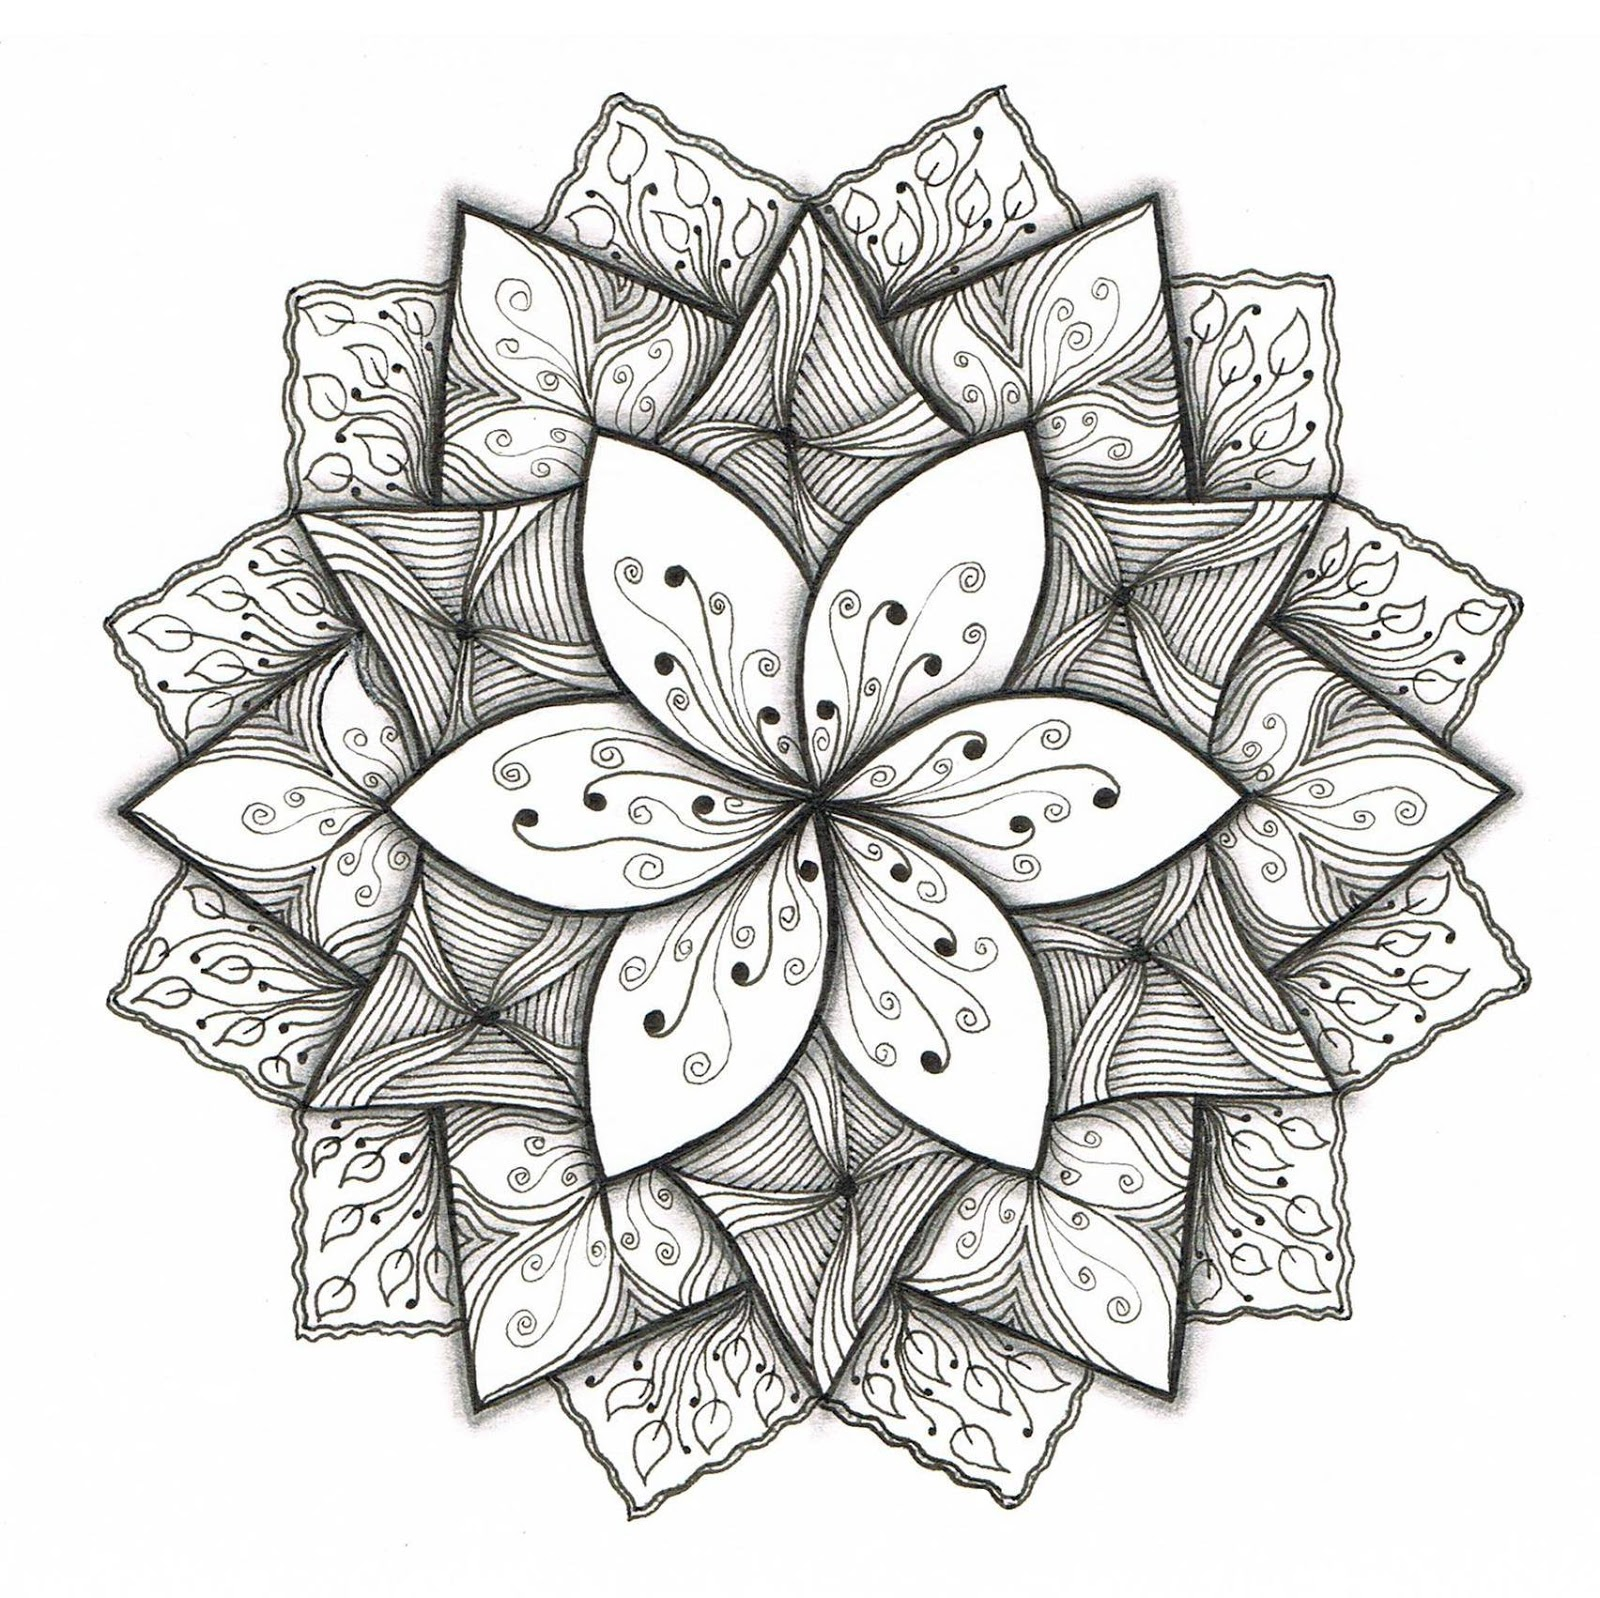 Drawn paper simple #12